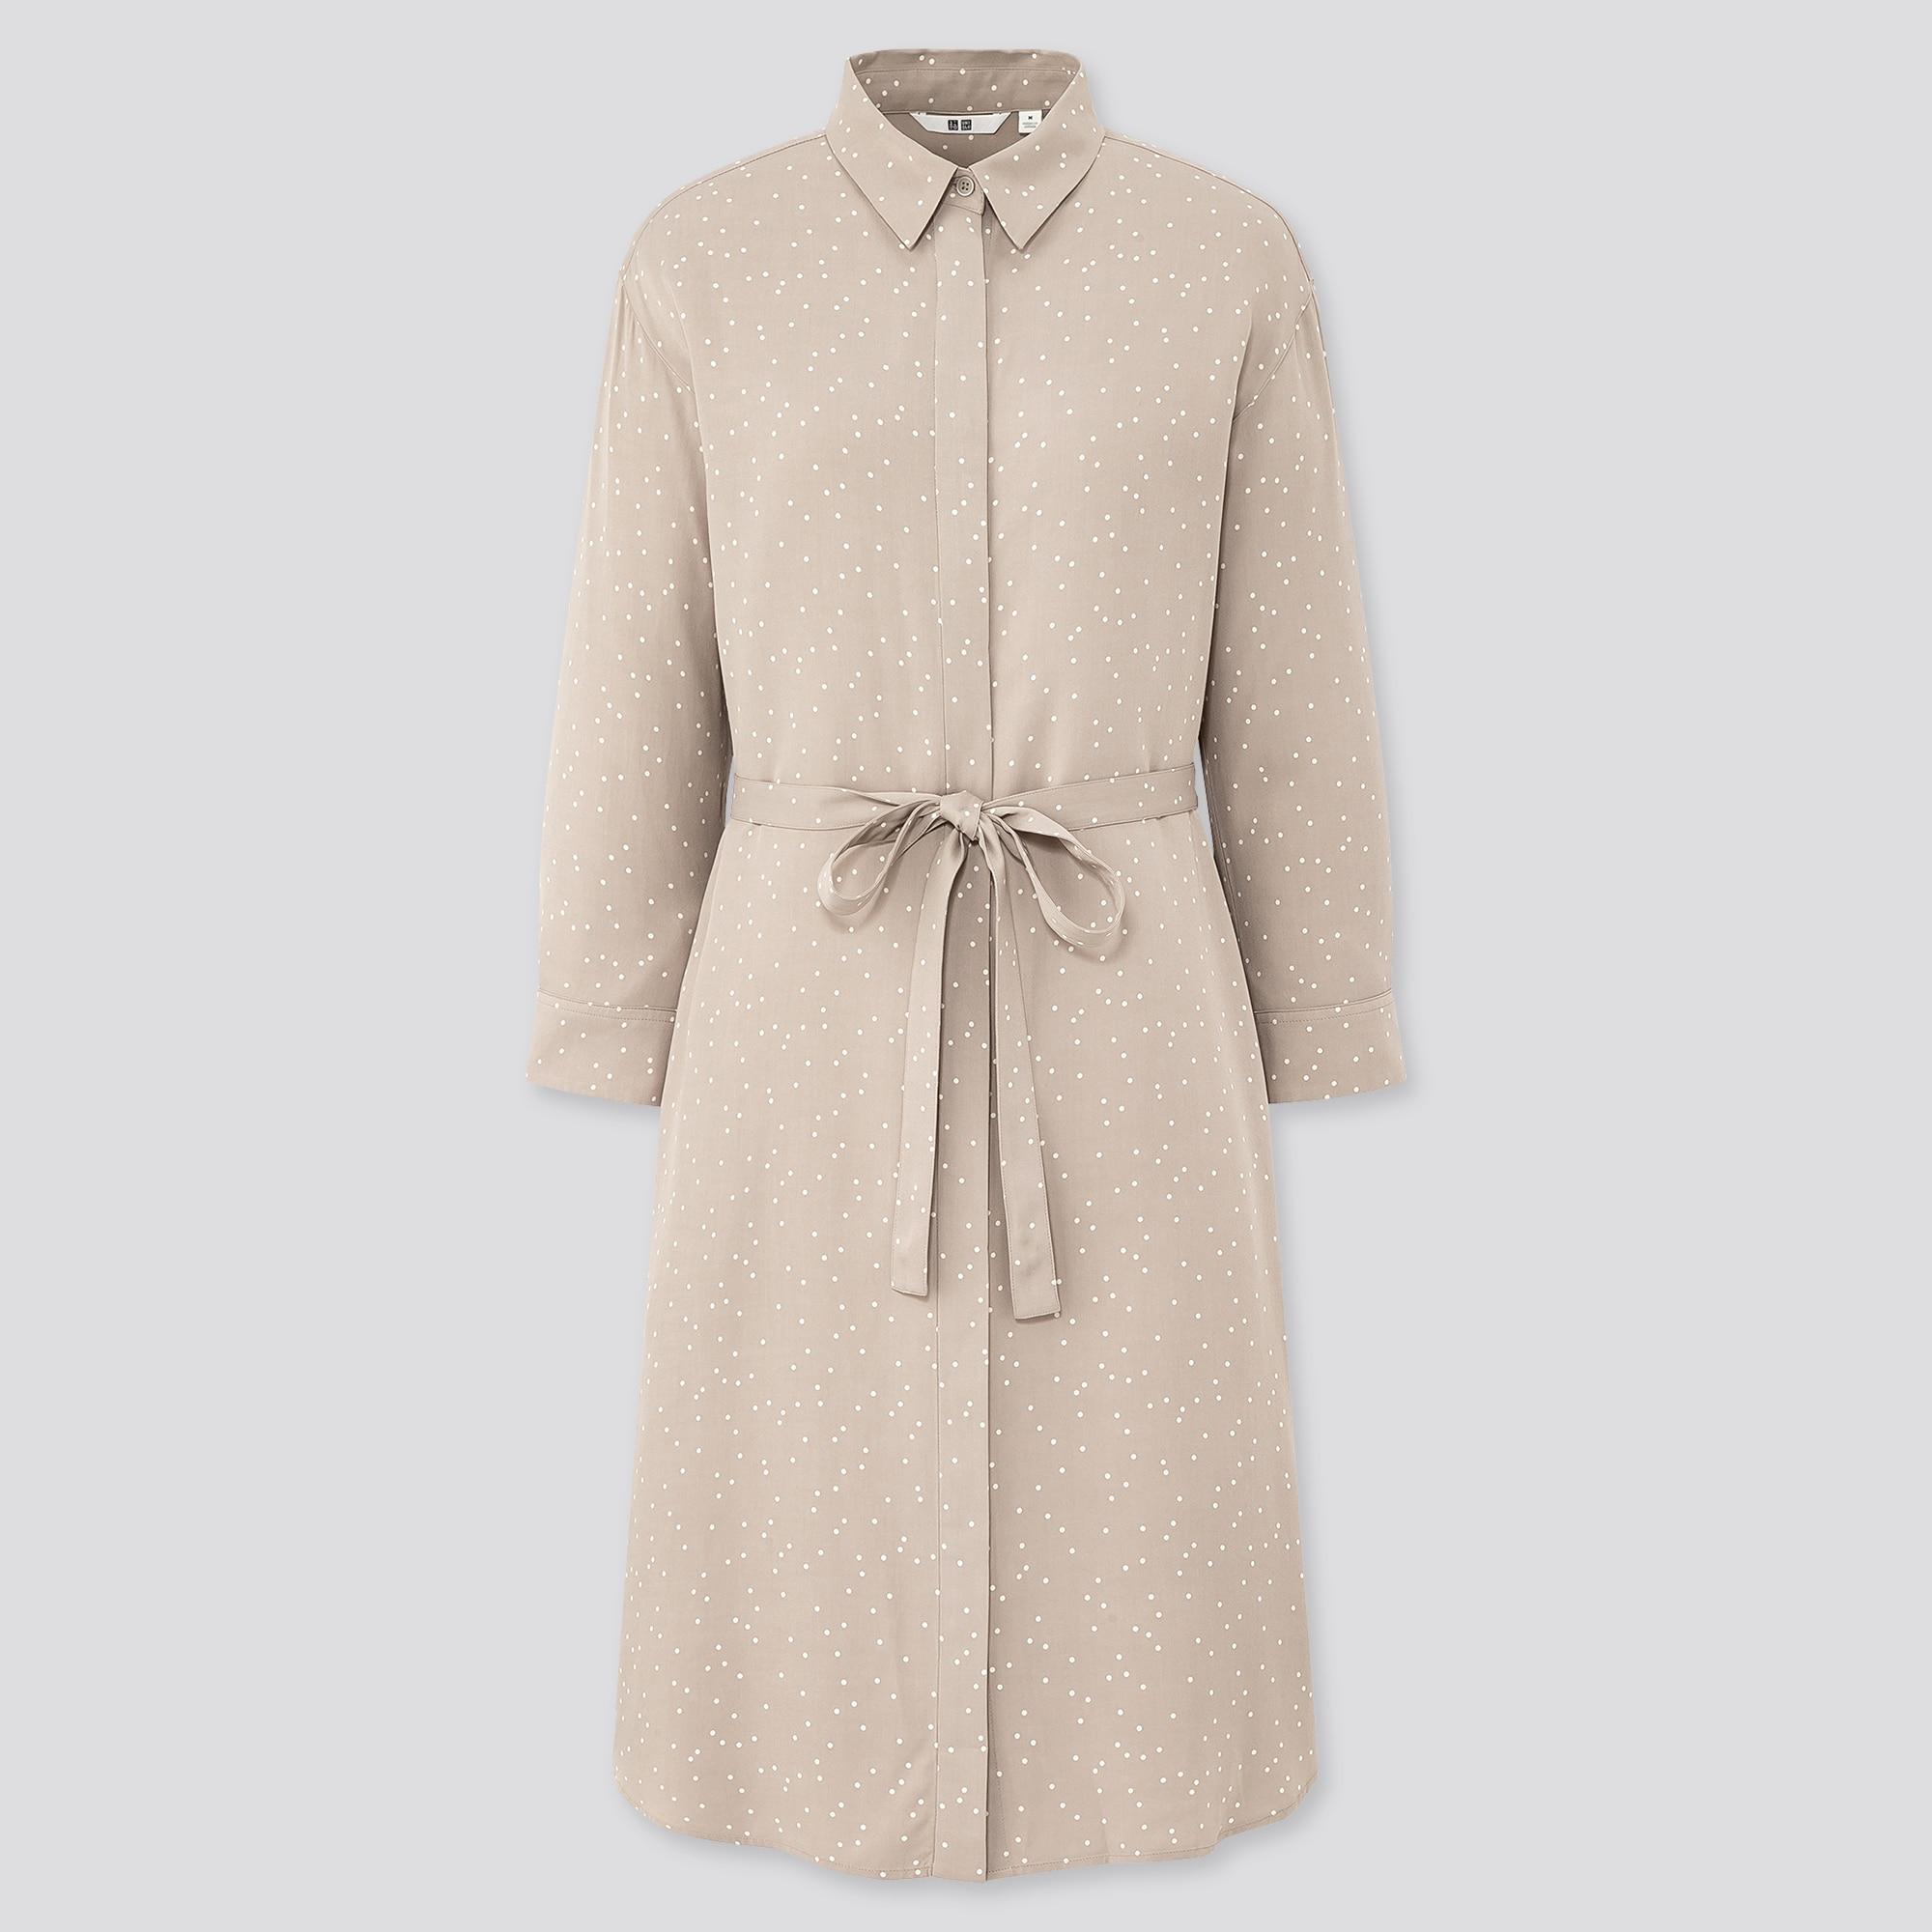 WOMEN RAYON PRINTED 3/4 SLEEVE SHIRT DRESS